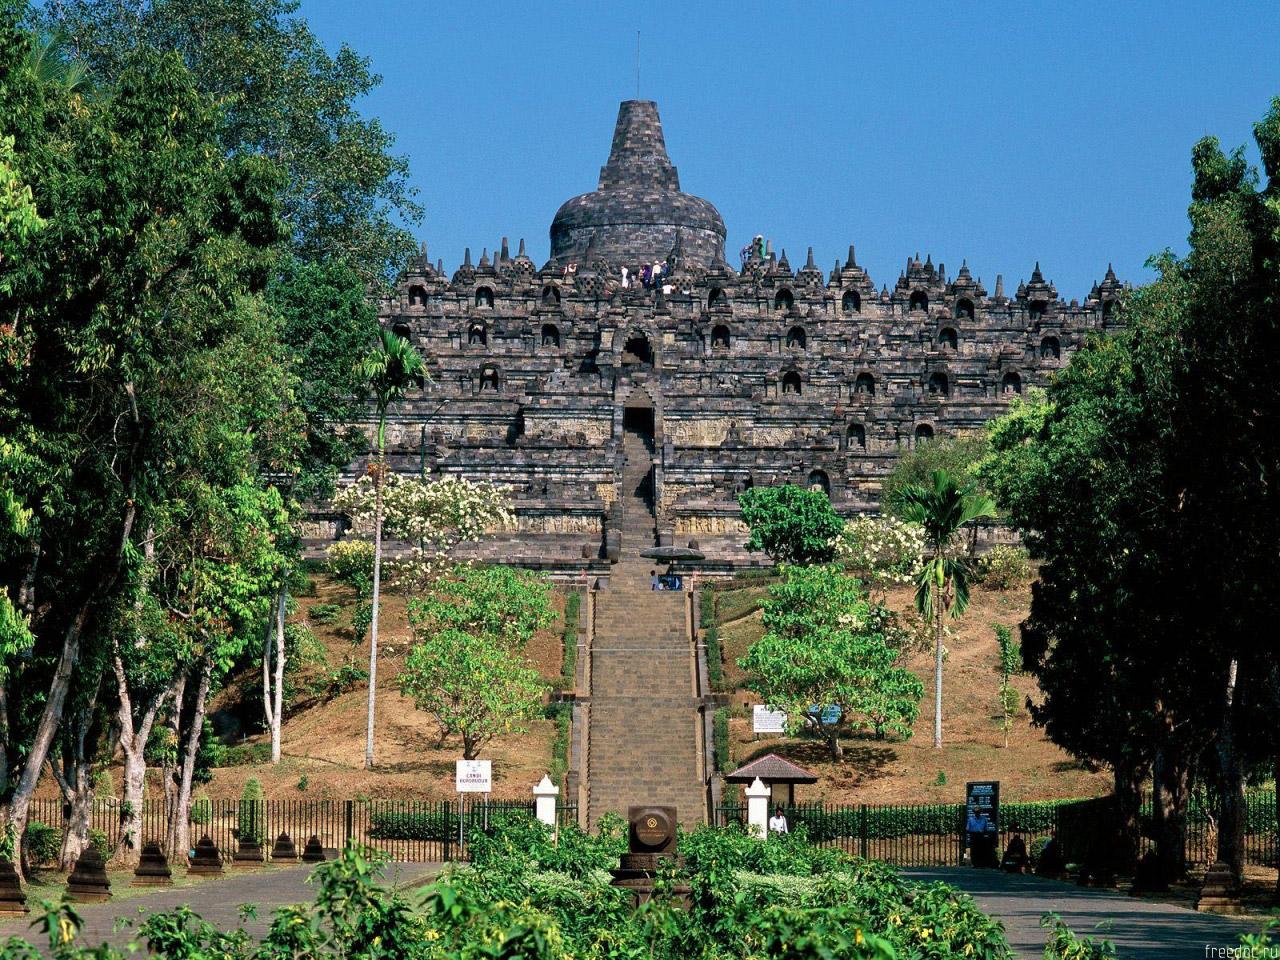 Bali Island YB9/F4BKV DX News